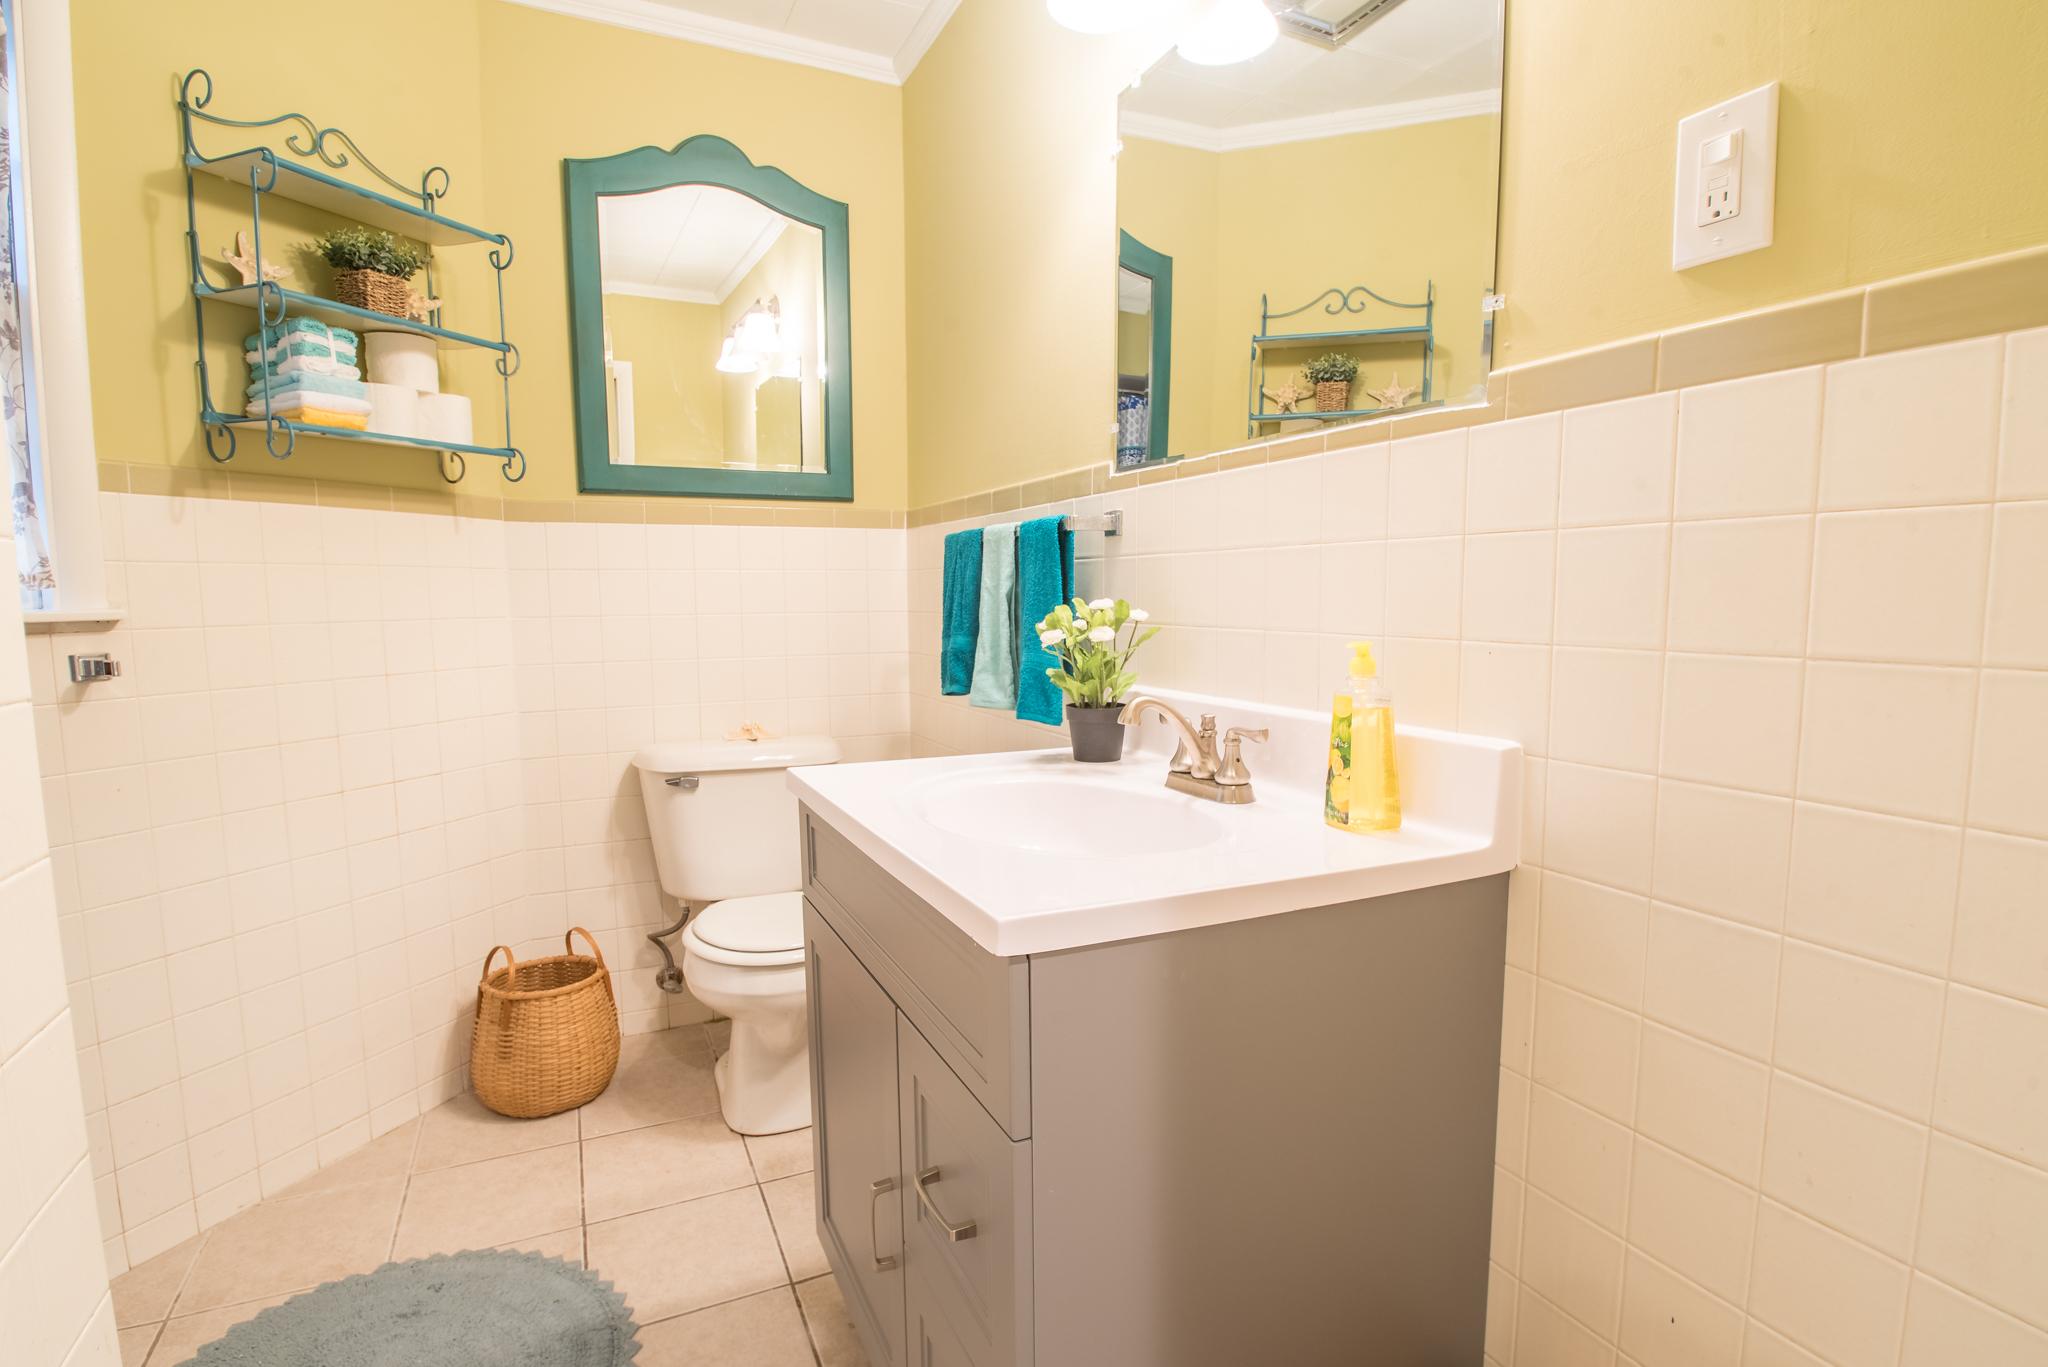 Renovated, bright full bath